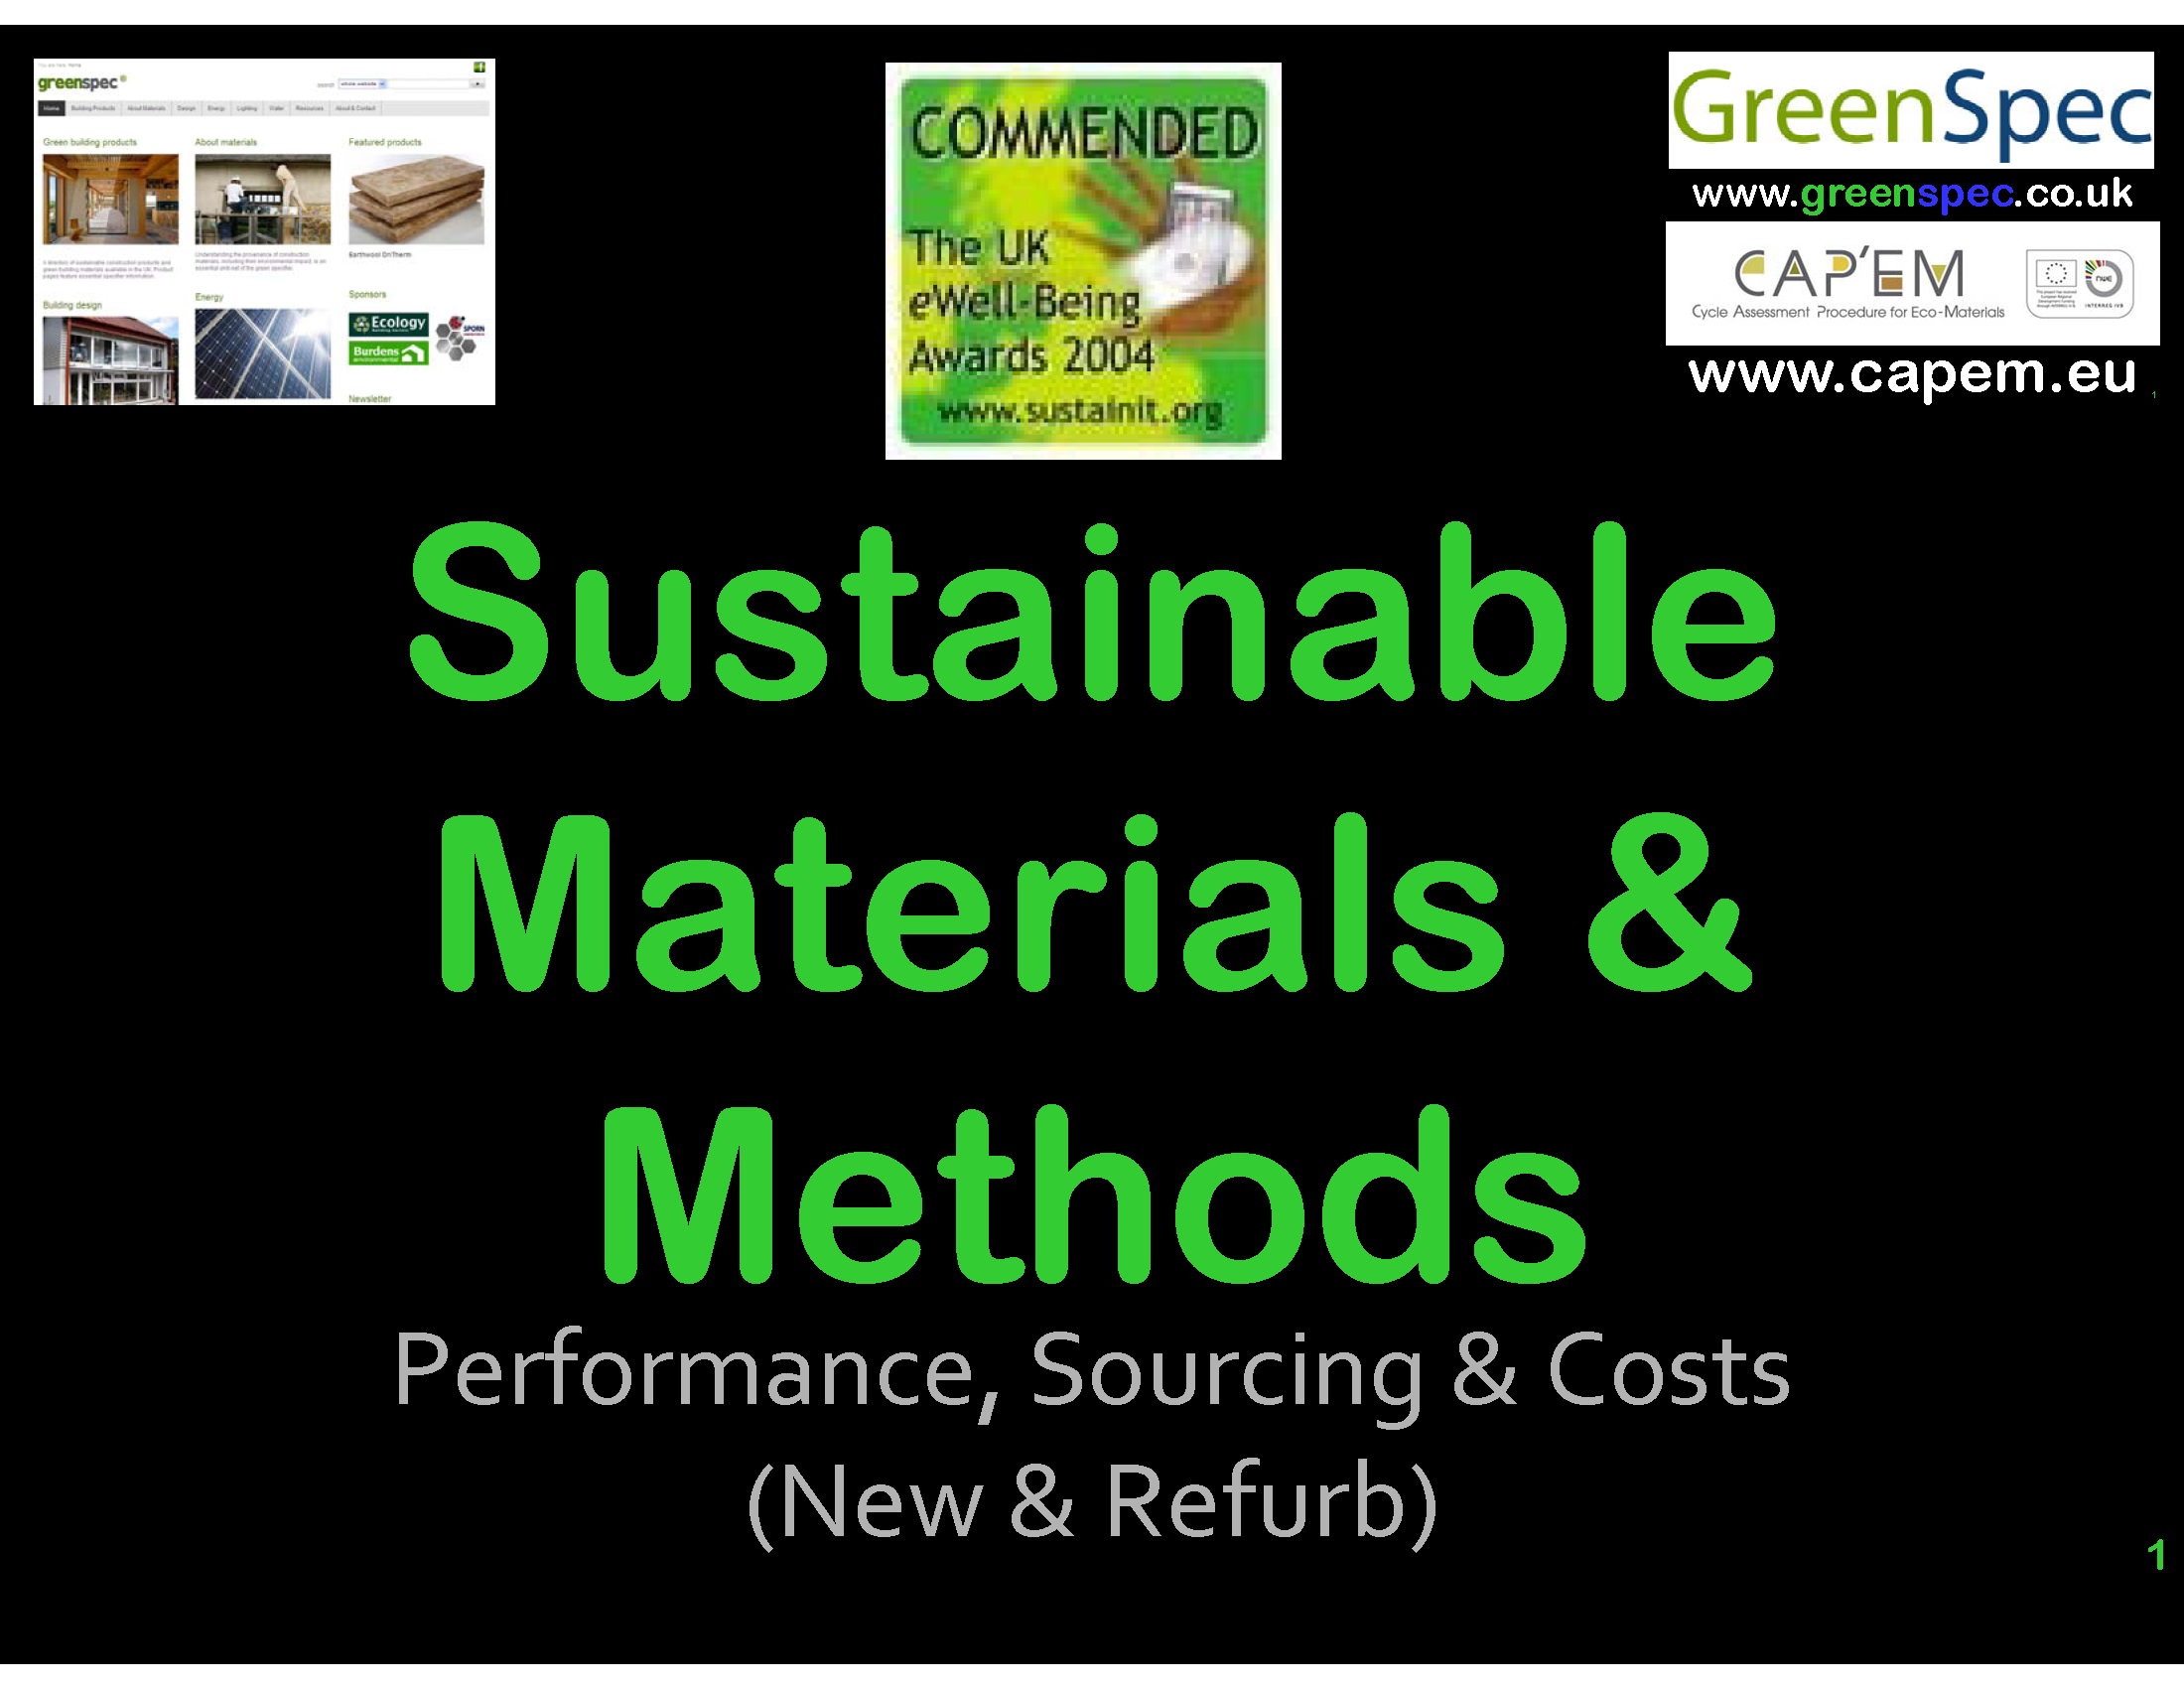 SustainableBuildingMaterials